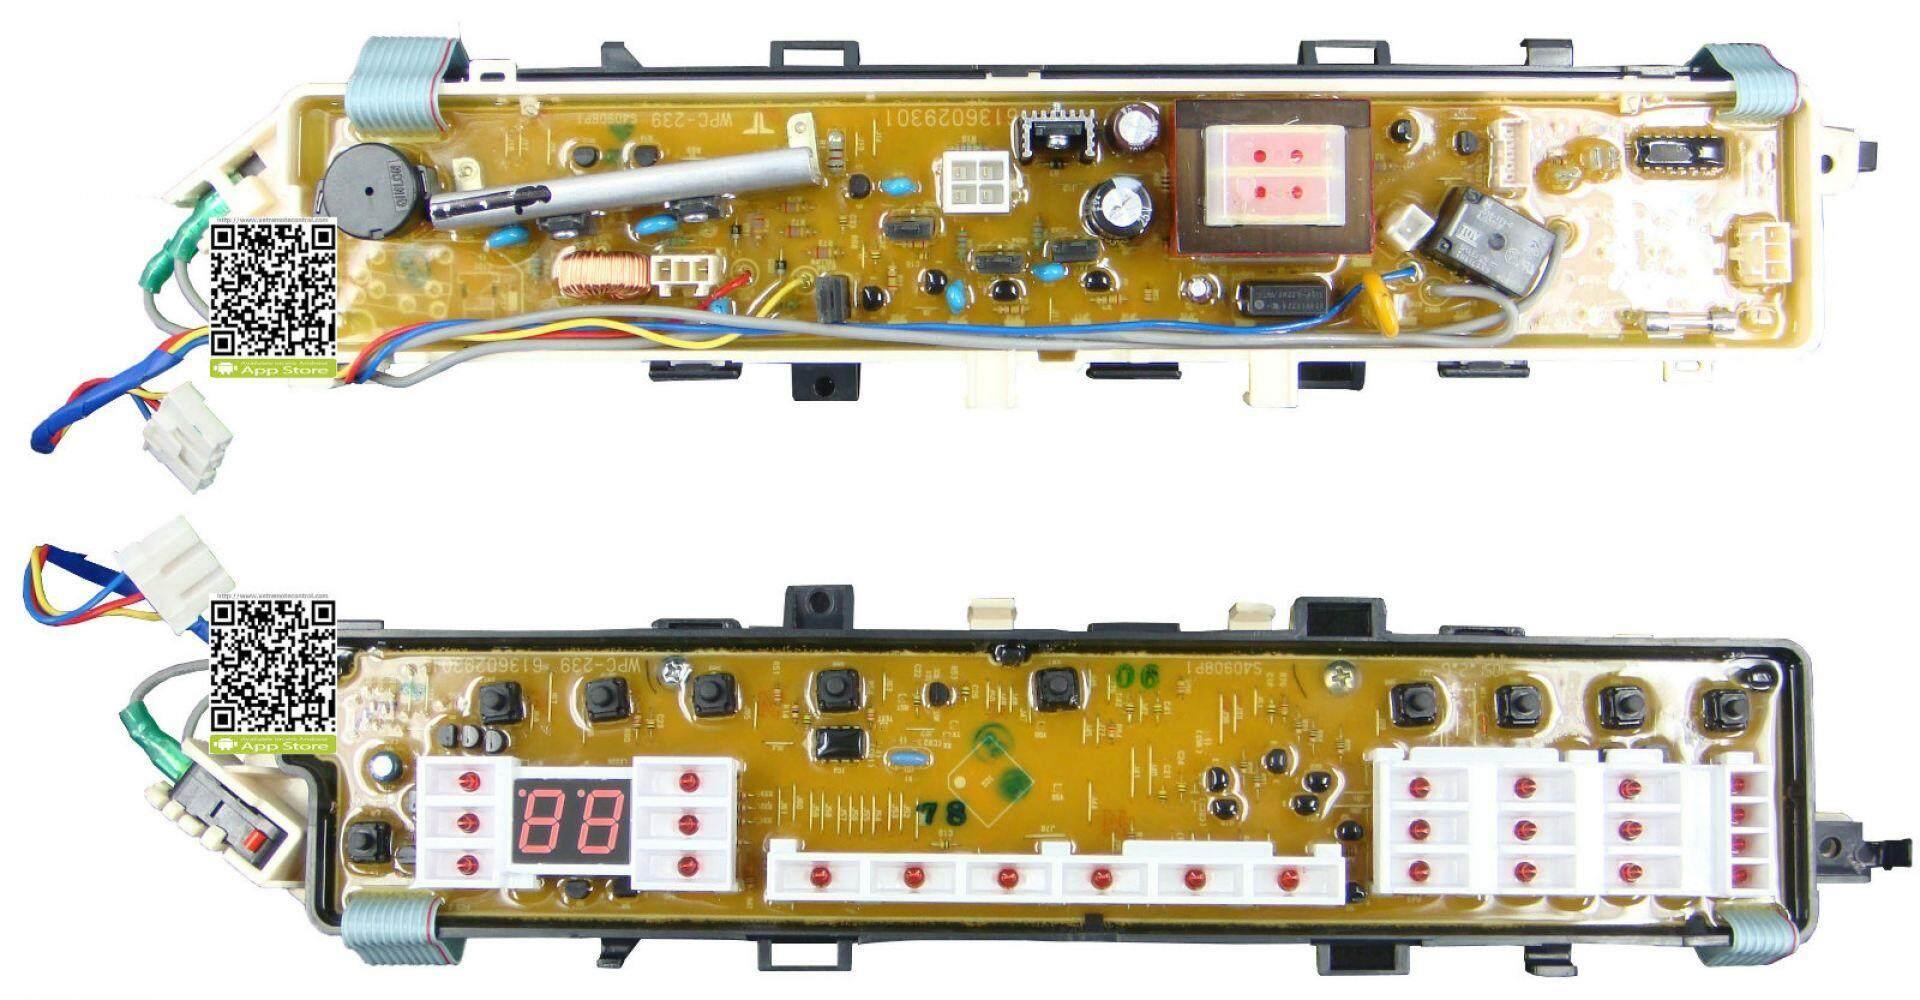 [PRE ORDER] AW-9790S TOSHIBA WASHING MACHINE CPU PCB BORAD-ORIGINAL